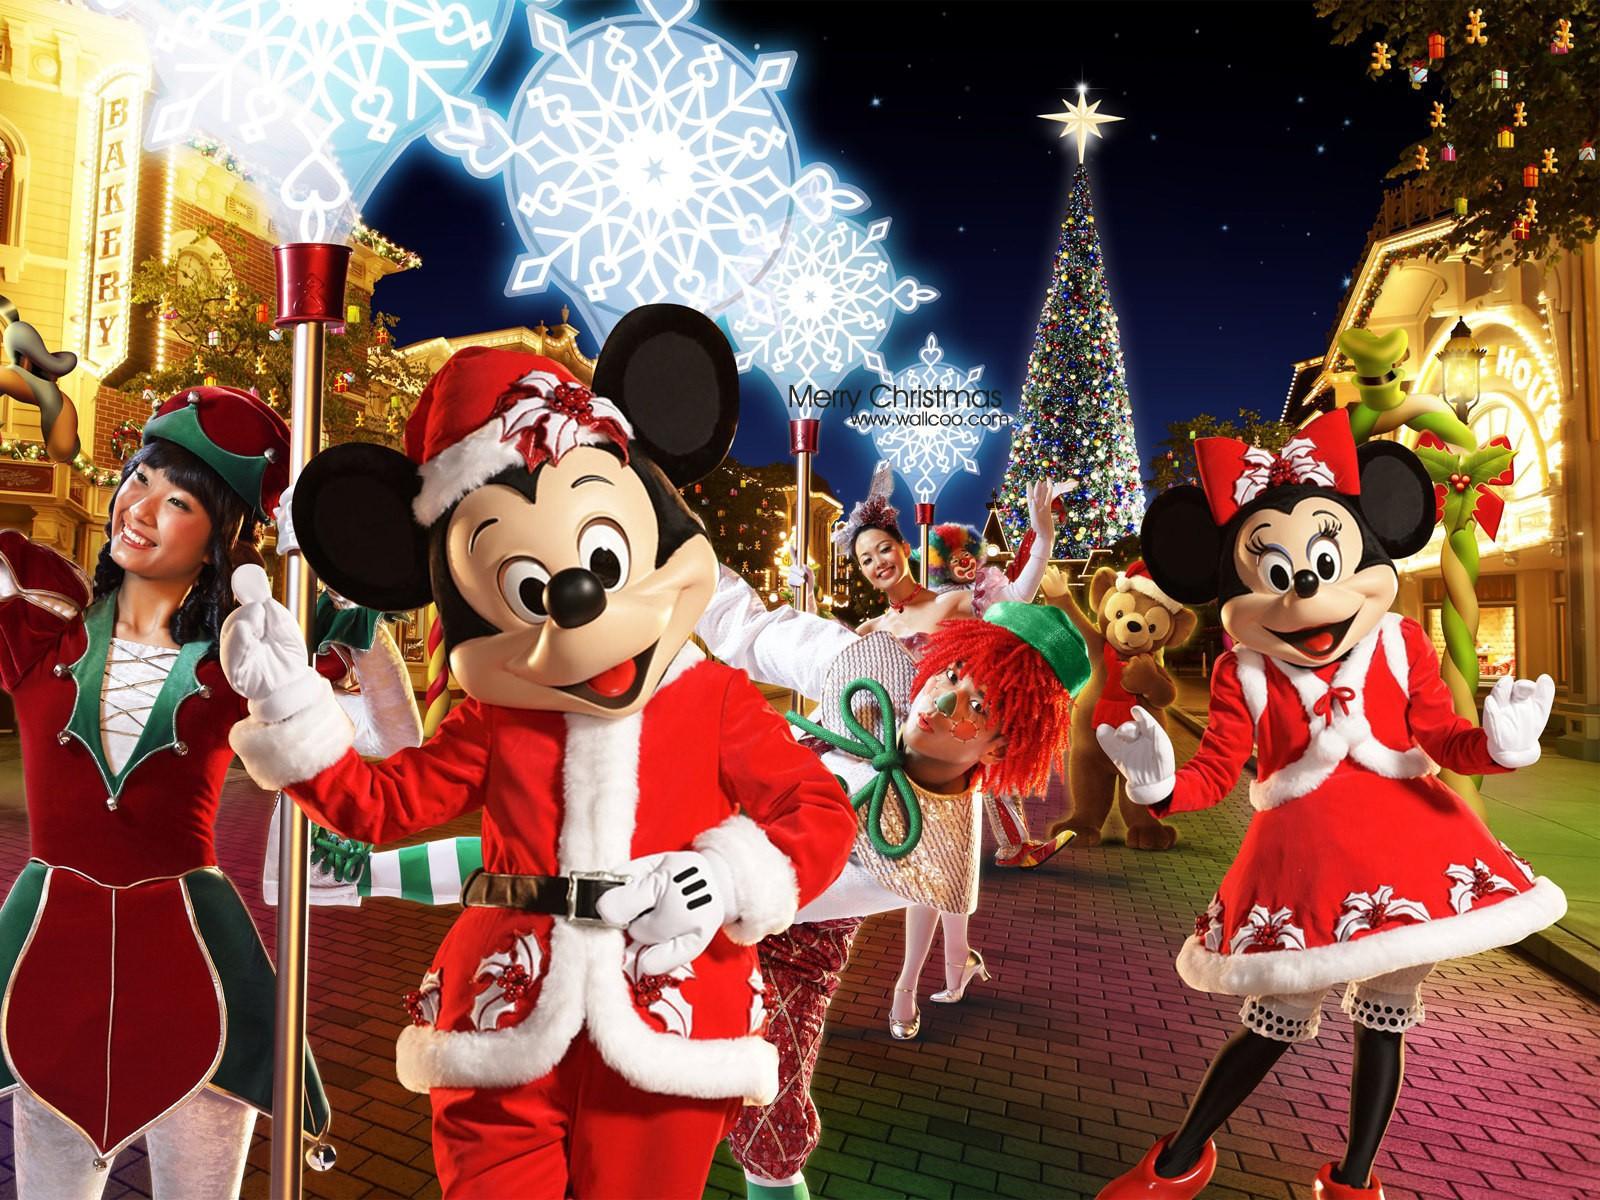 Wonderful Wallpaper Christmas Mickey Mouse - Christmas_wallpapers____Mickey_mouse_on_Christmas_069796_  Trends_346861 .jpg